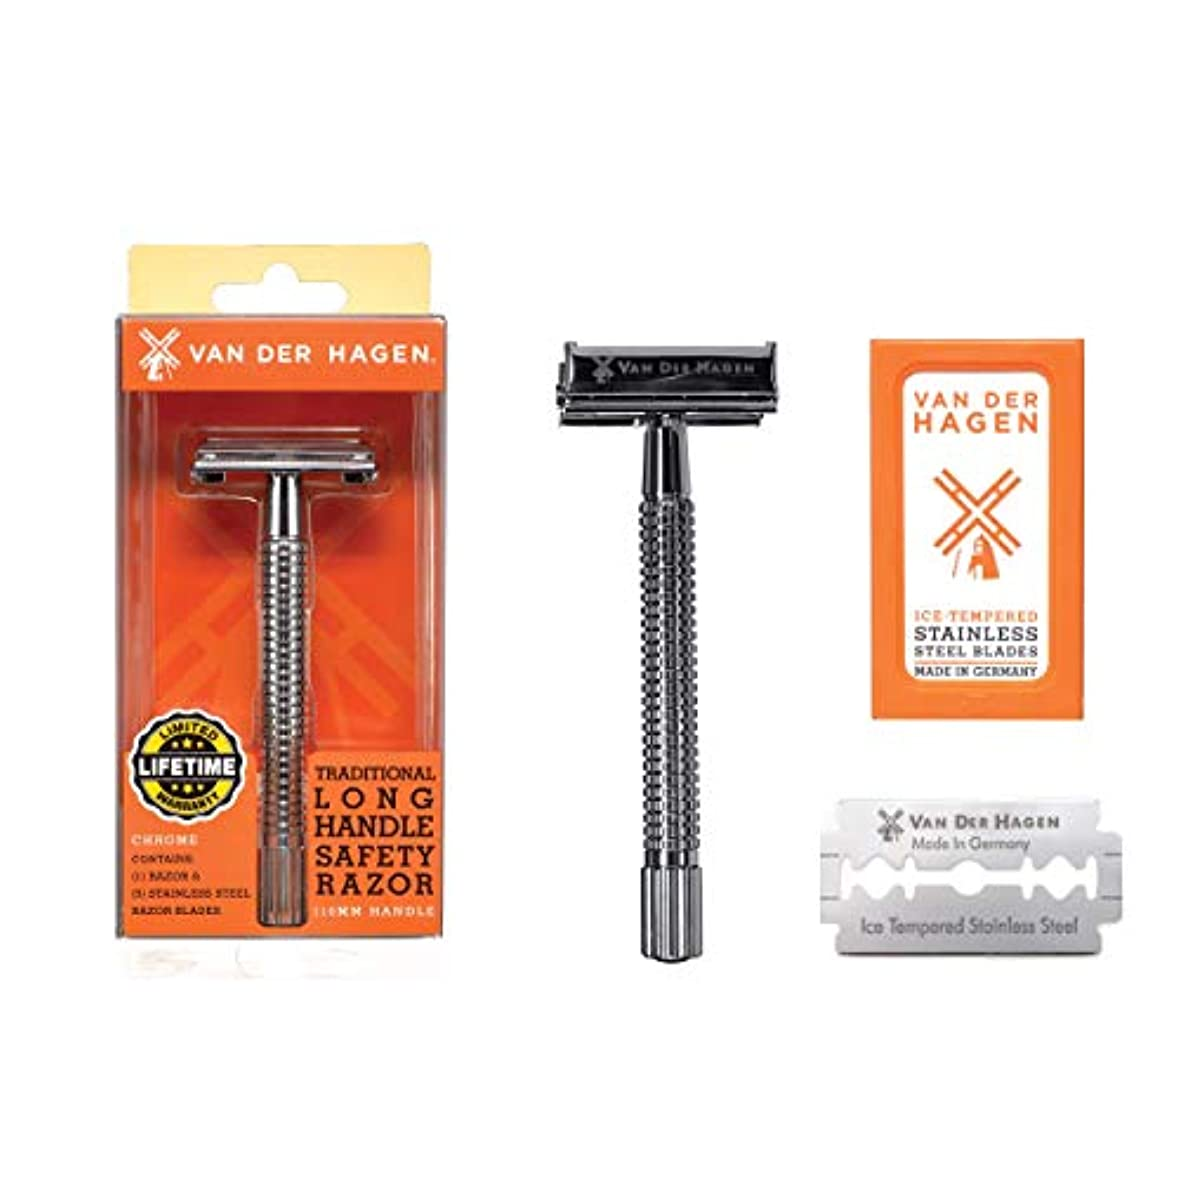 Van der Hagen Razors long handle ヴァンデルハーゲンレイザーズロングハンドル安全剃刀, 髭剃り [並行輸入品]